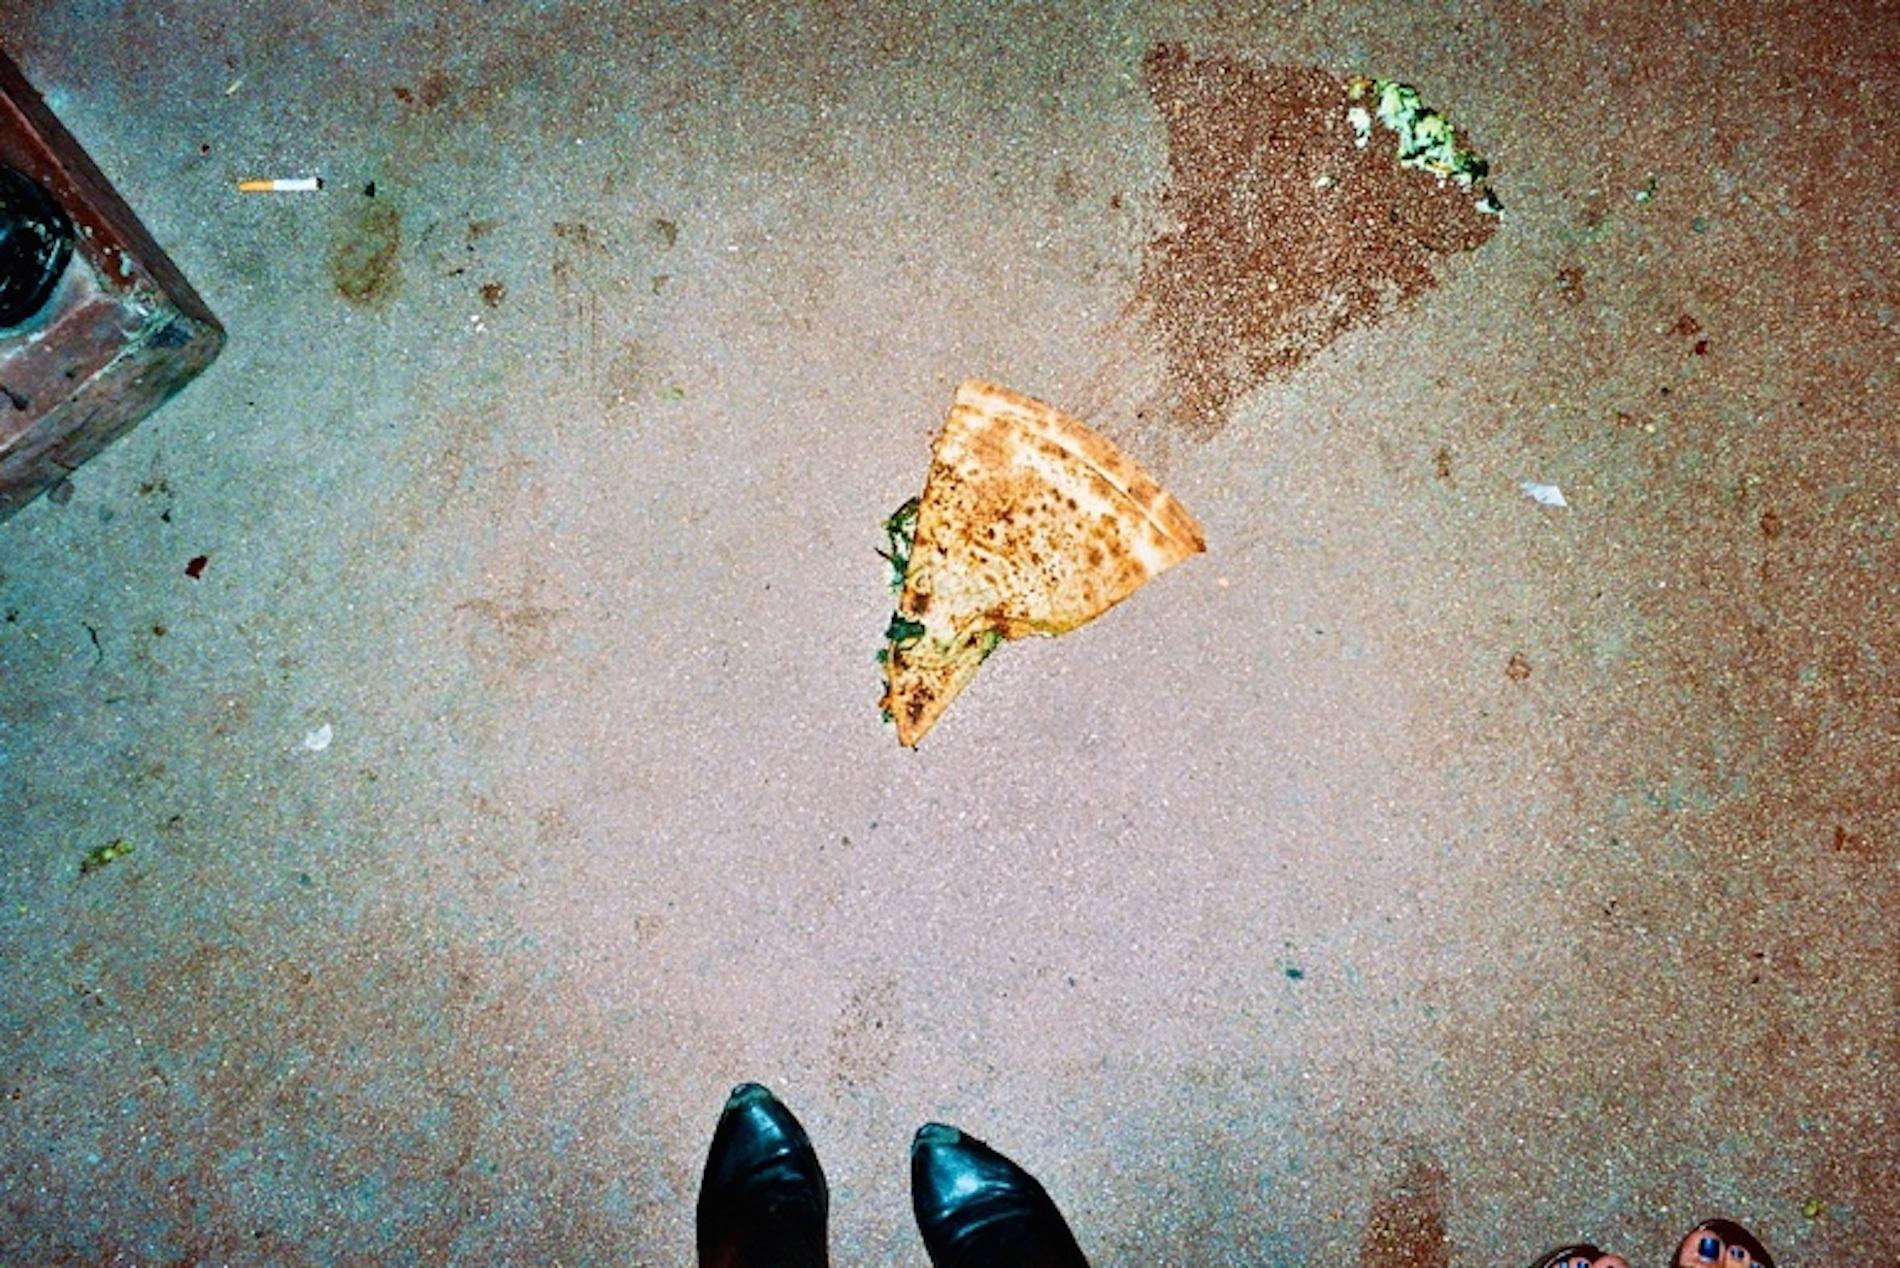 lindsay-dye-photography-art-pizza.jpg